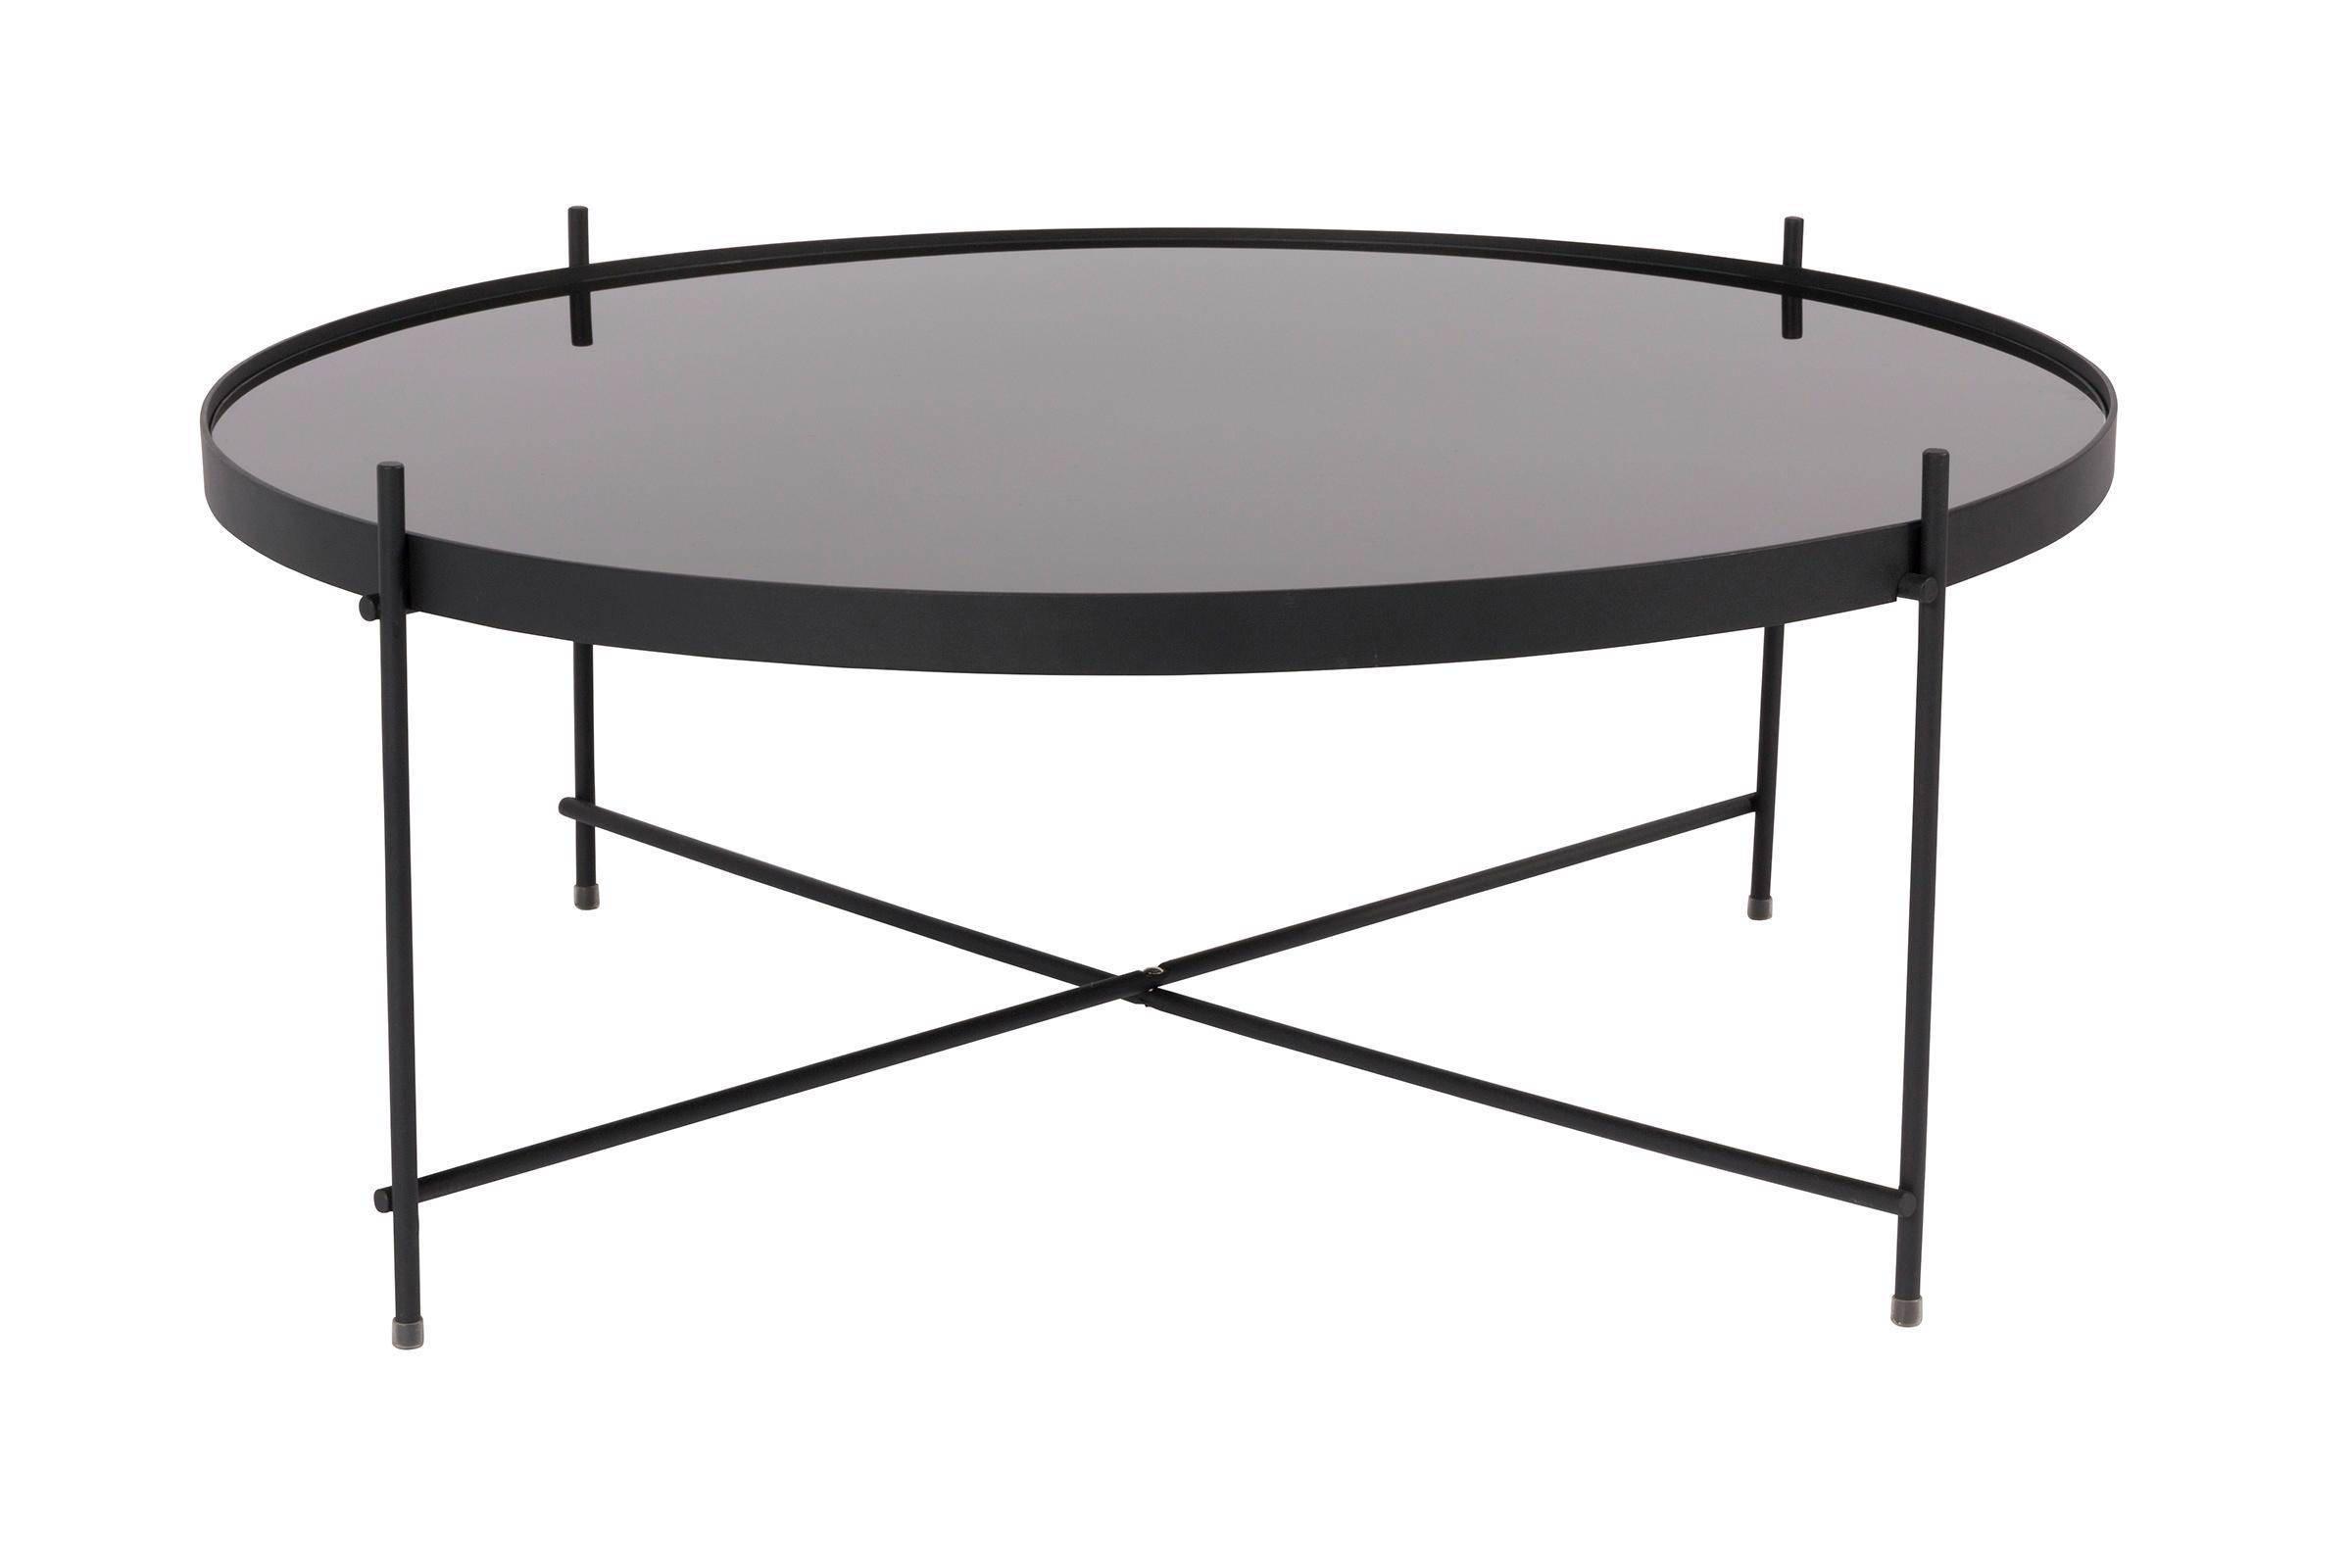 Zuiver tafels bij wehkamp gratis bezorging vanaf